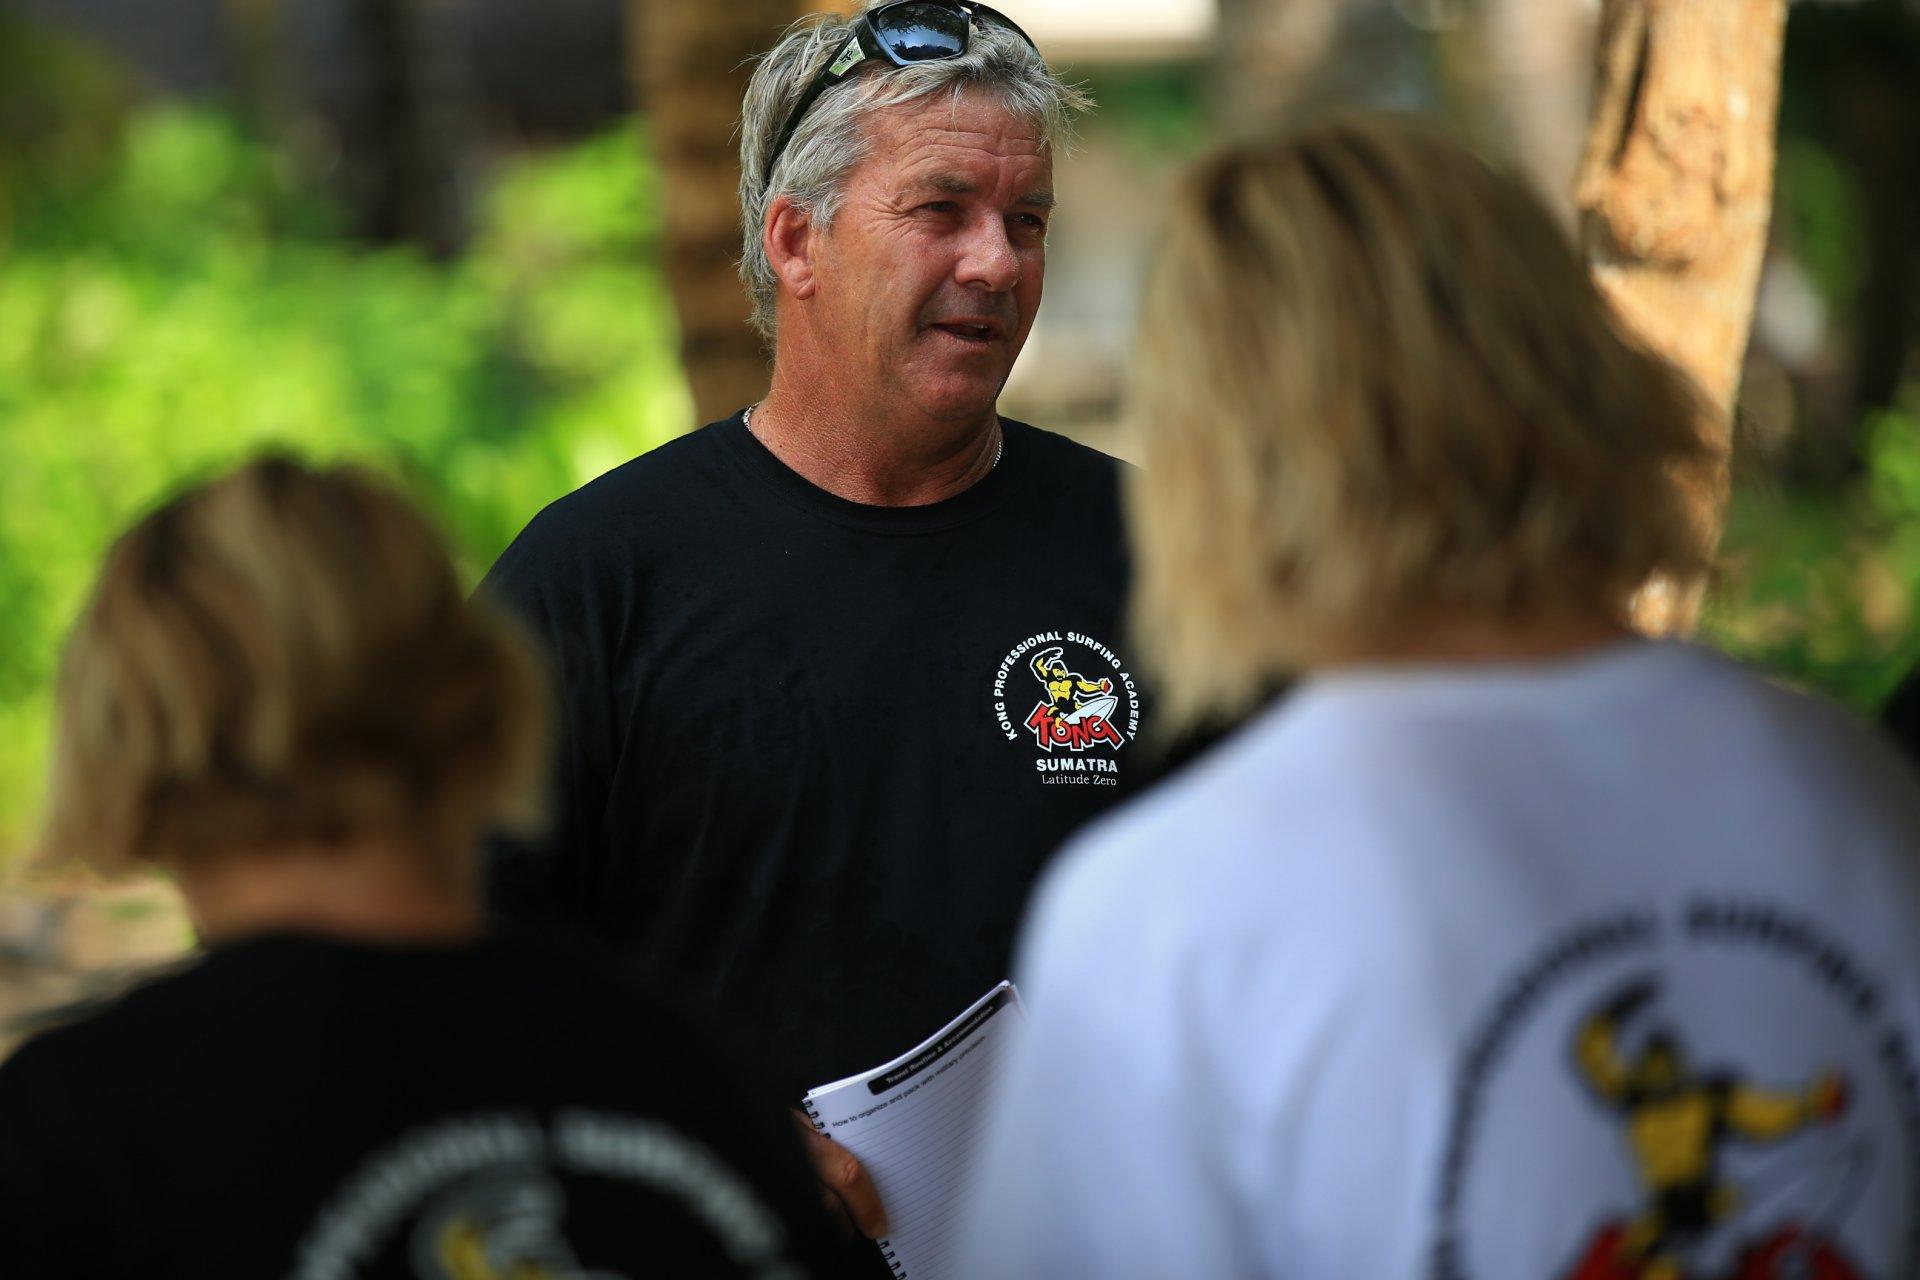 kong, Gary Elkerton, resort latitude zero, Telo Islands, Sumatra, Indonesia, Training Camp